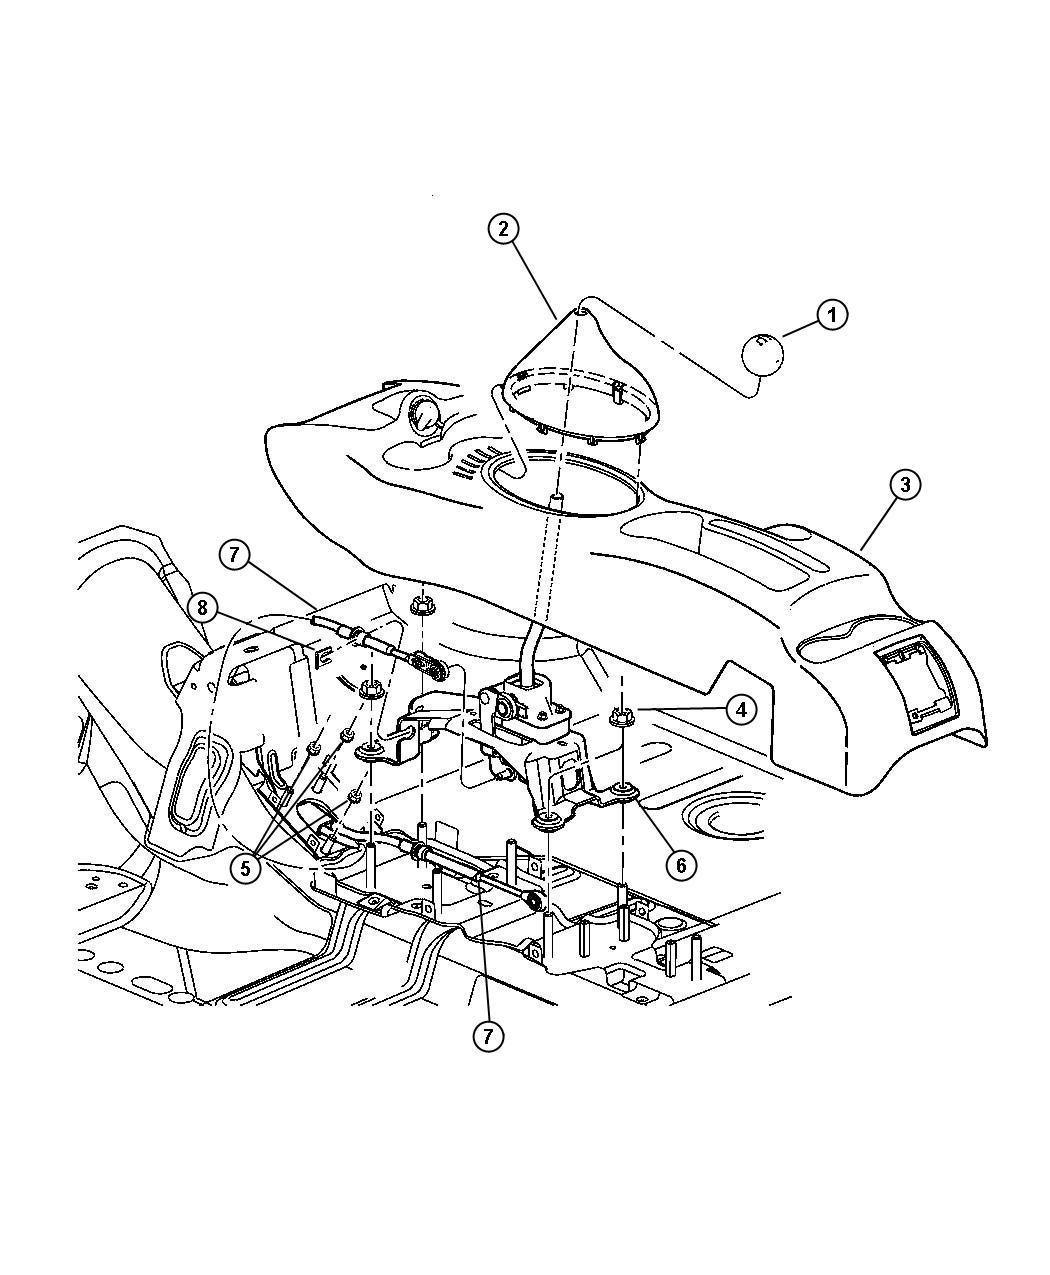 2003 Chrysler PT Cruiser Knob. Gearshift. With [shift knob